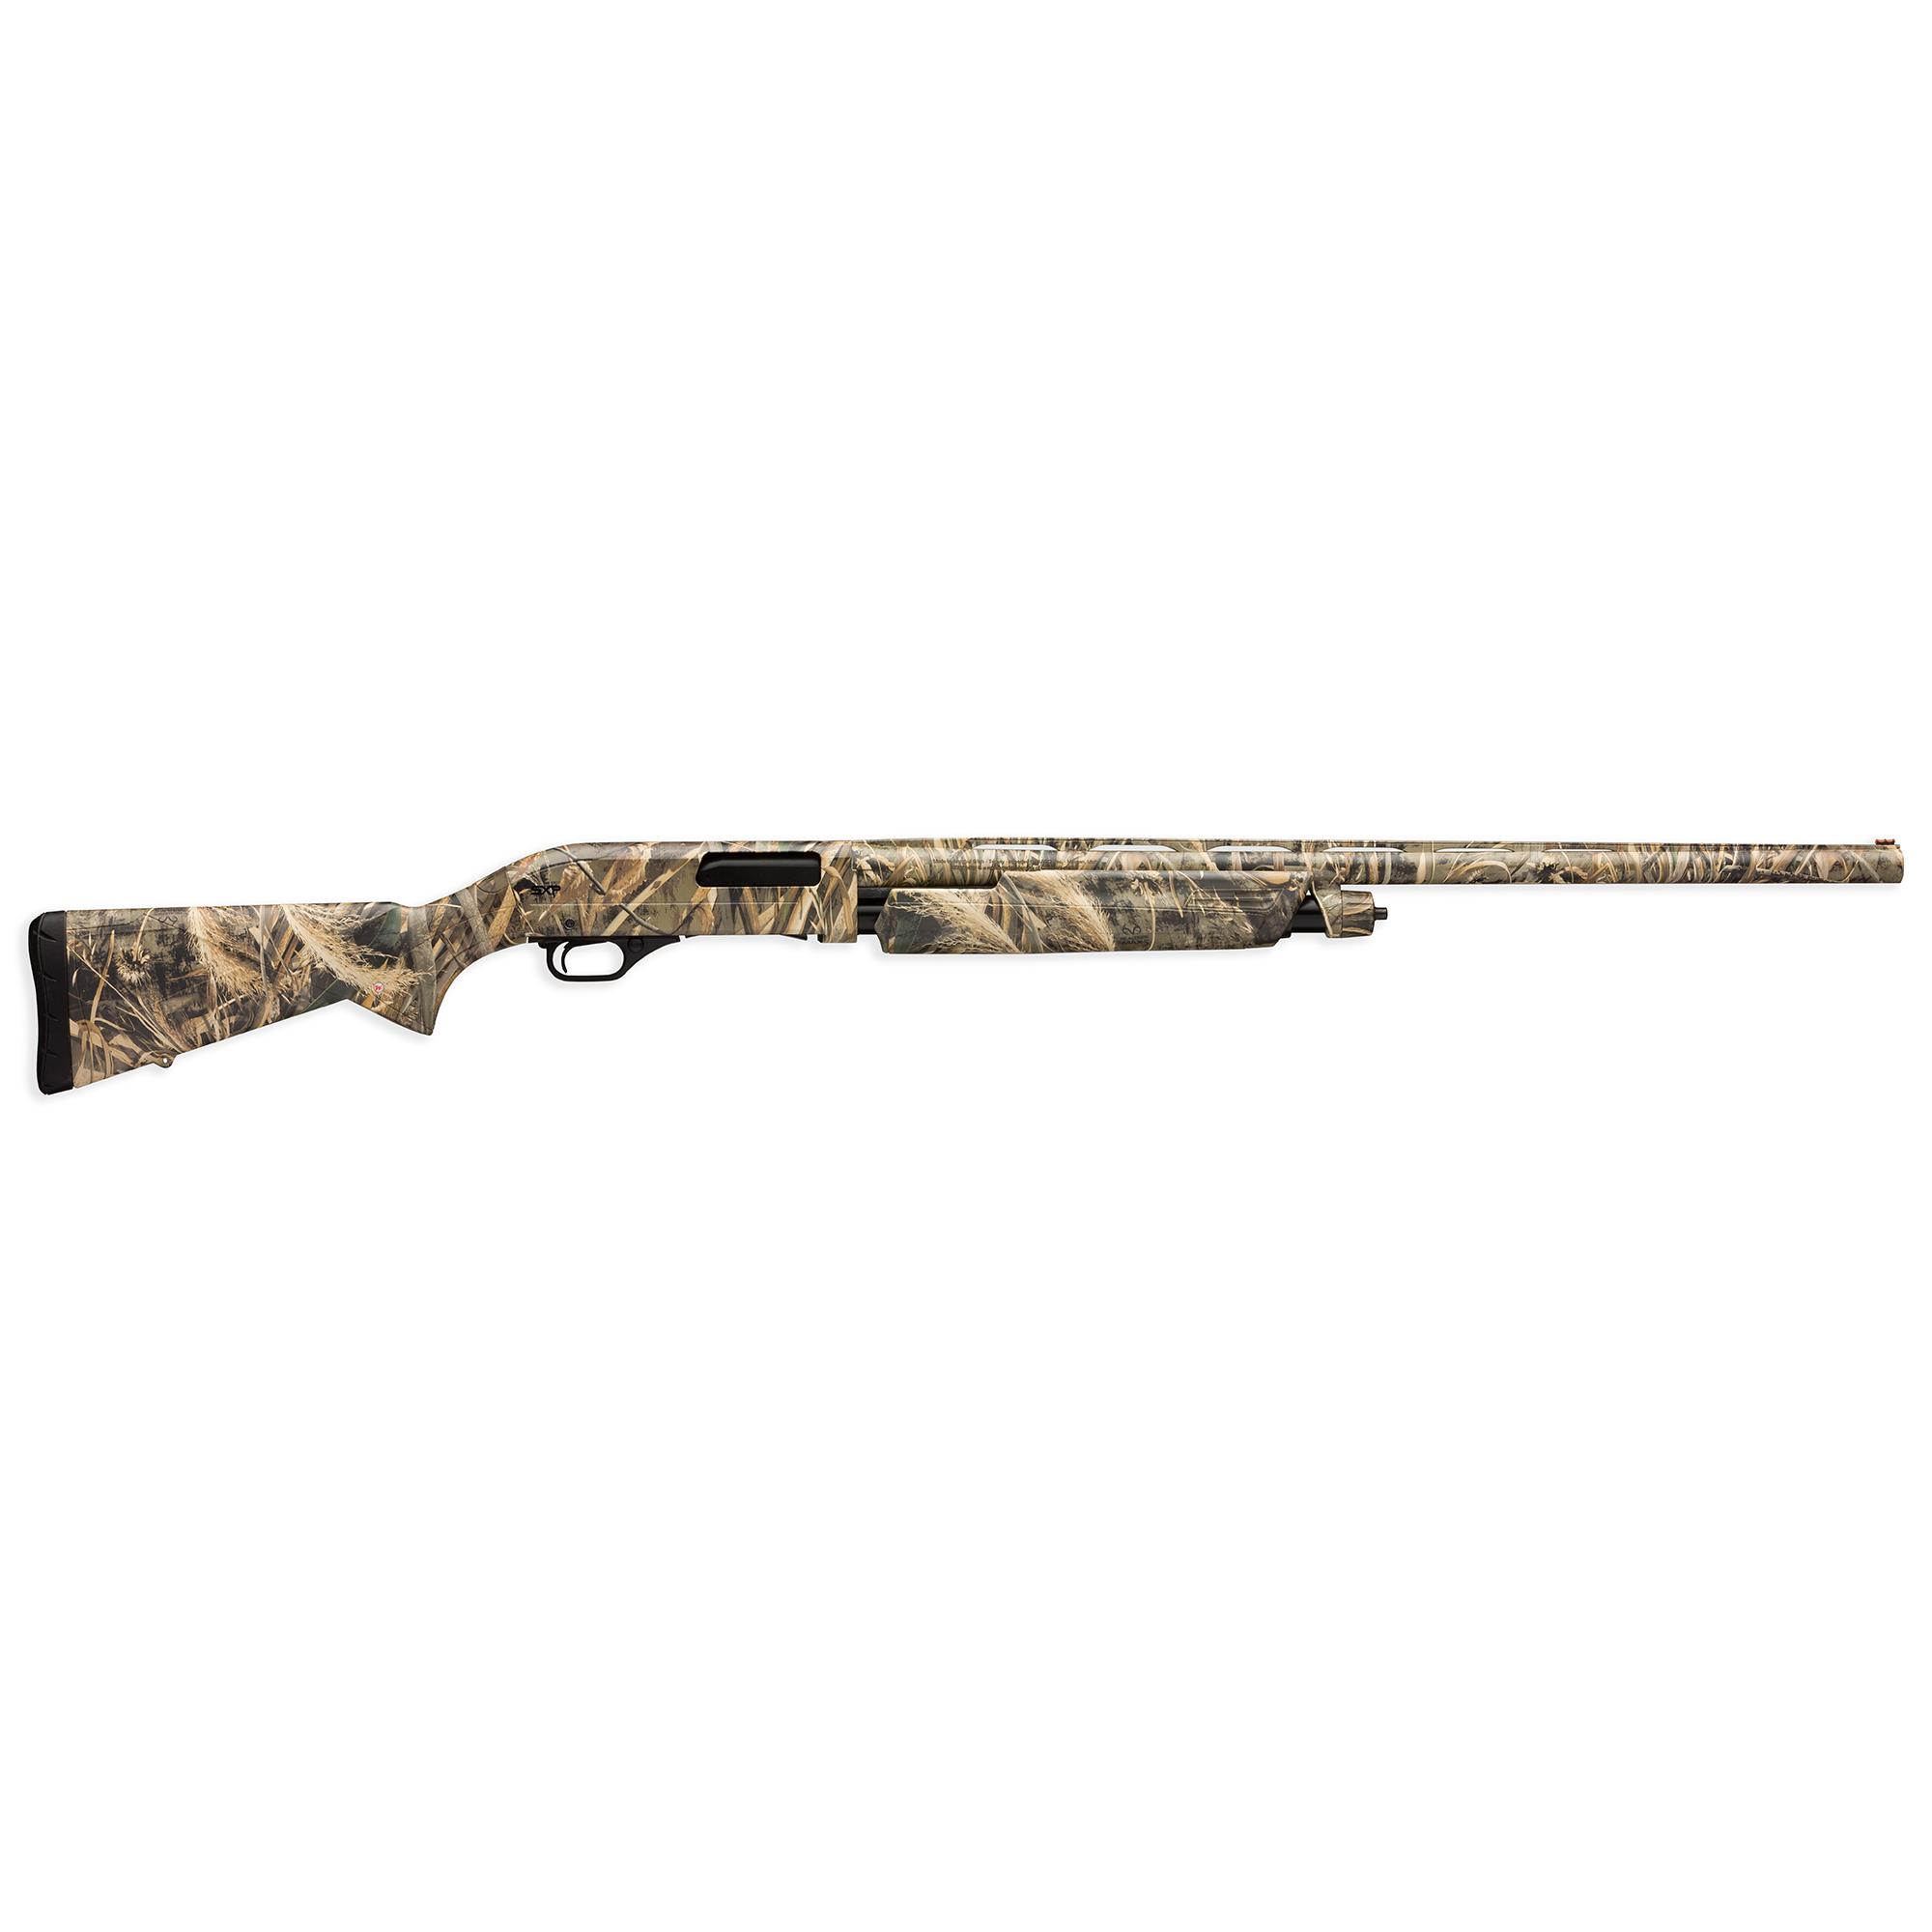 Winchester Super X Pump Waterfowl Shotgun, 12 Ga, Realtree Max-5 Camo, 28″ BBL